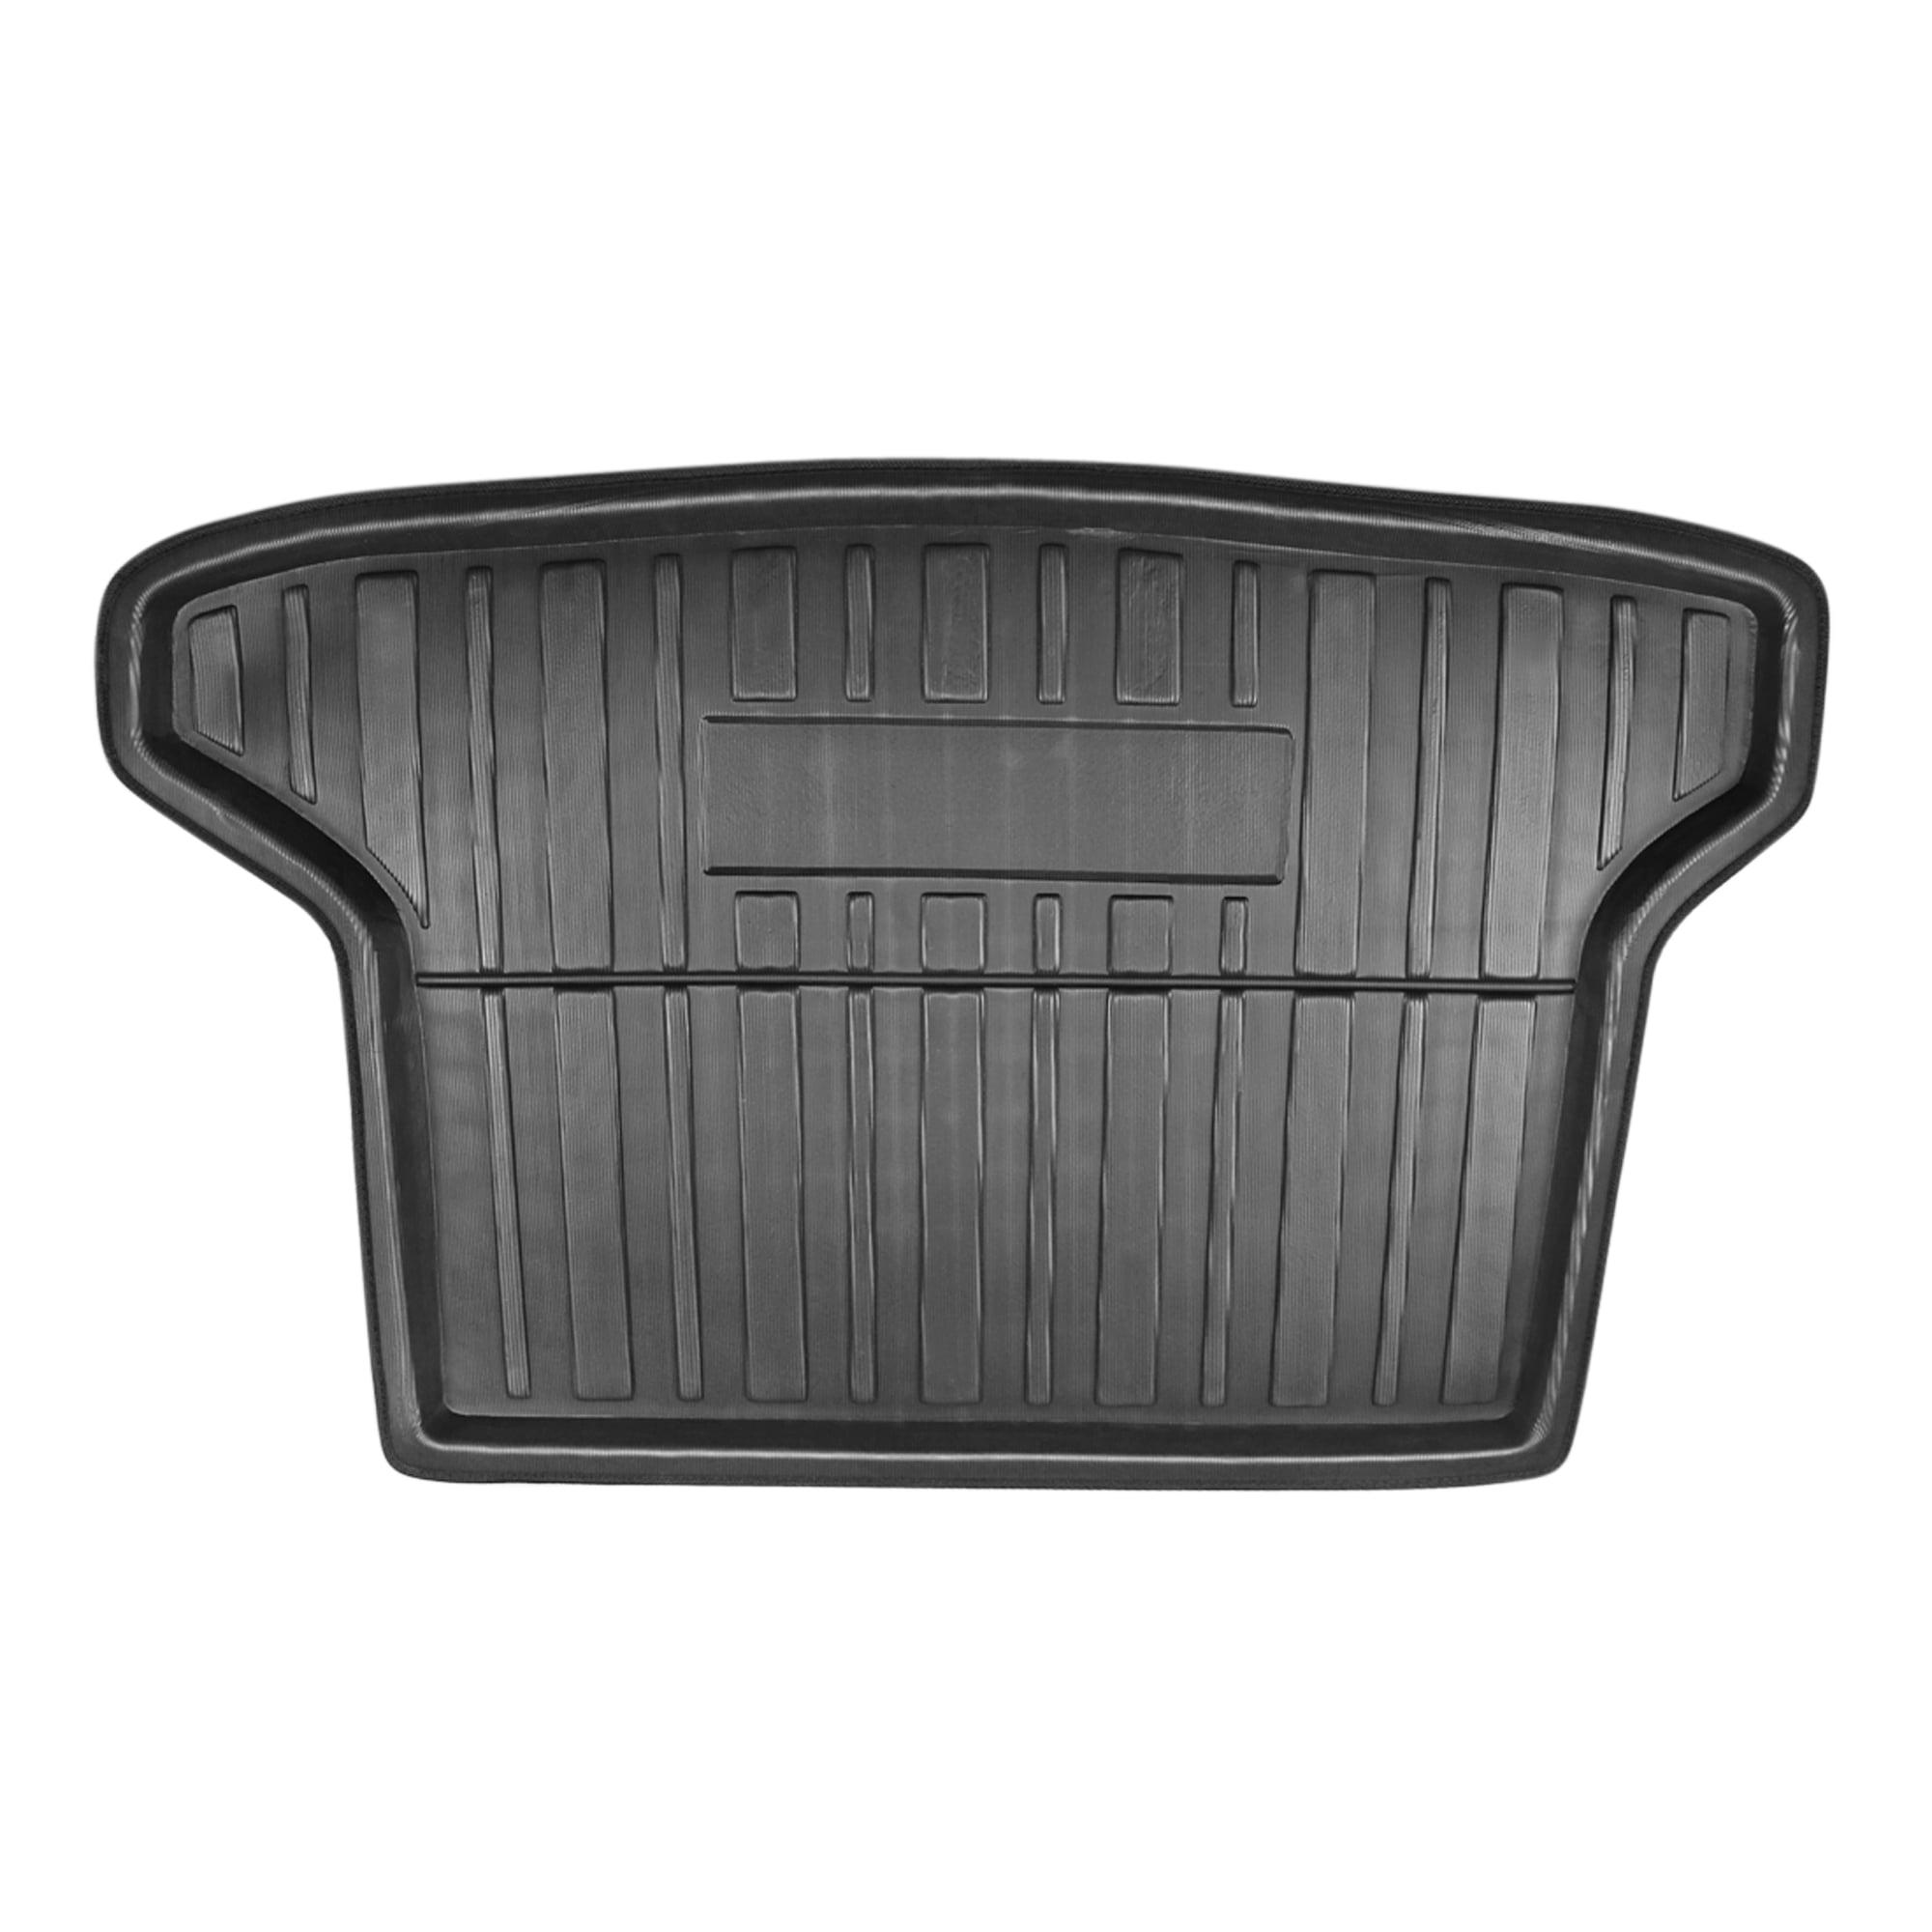 Rear Trunk Boot Liner Cargo Mat Floor Tray Cover for Honda HRV 2014-2018